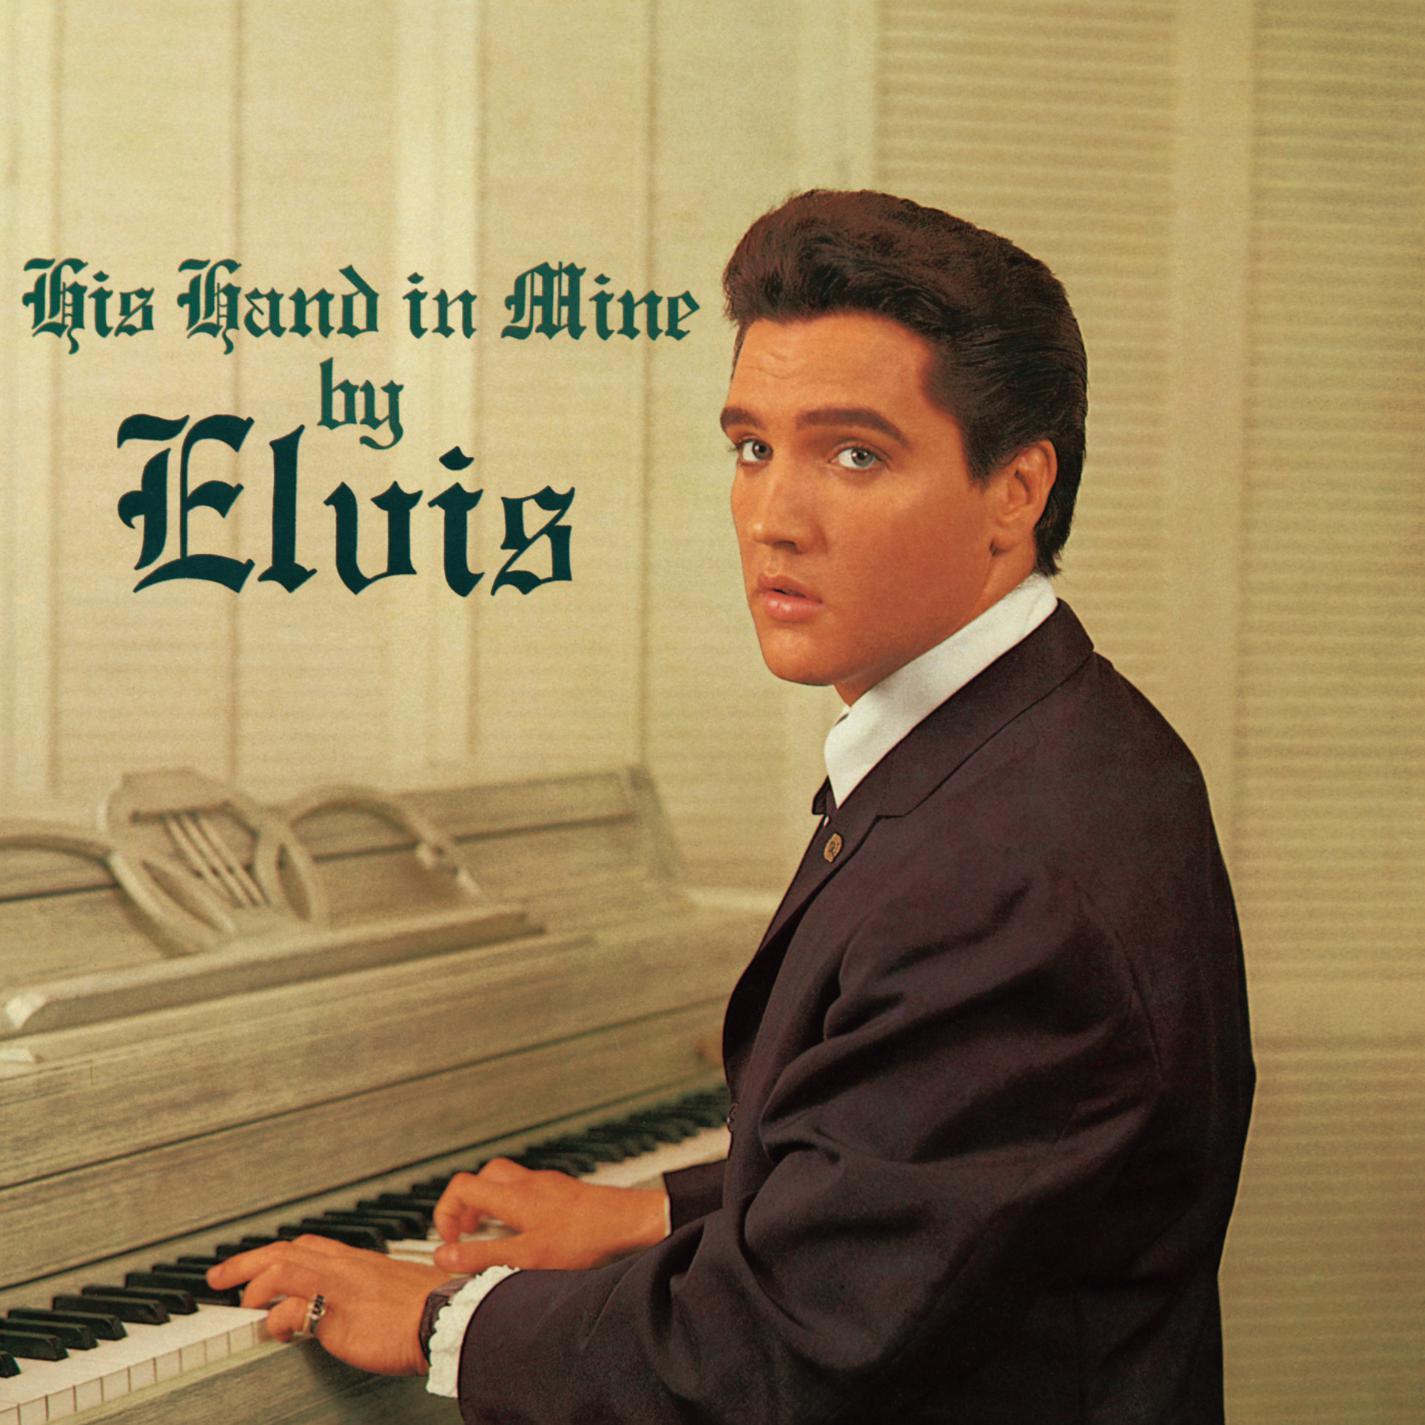 Elvis Presley - His Hand In Mine (1960/2015) [Official Digital Download 24/96] RE-UP